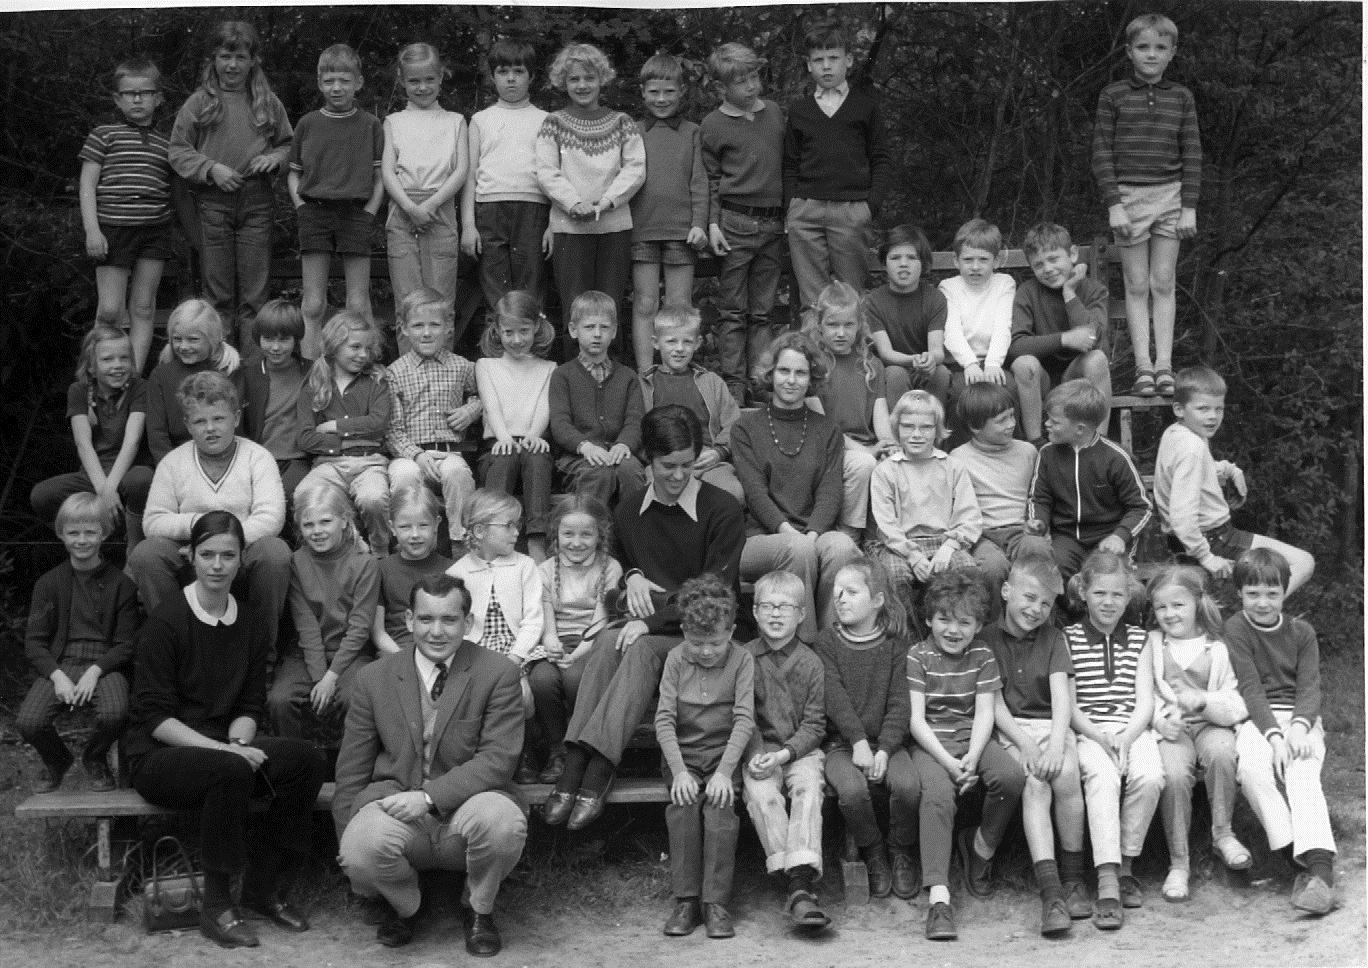 Groningse Schoolvereniging foto